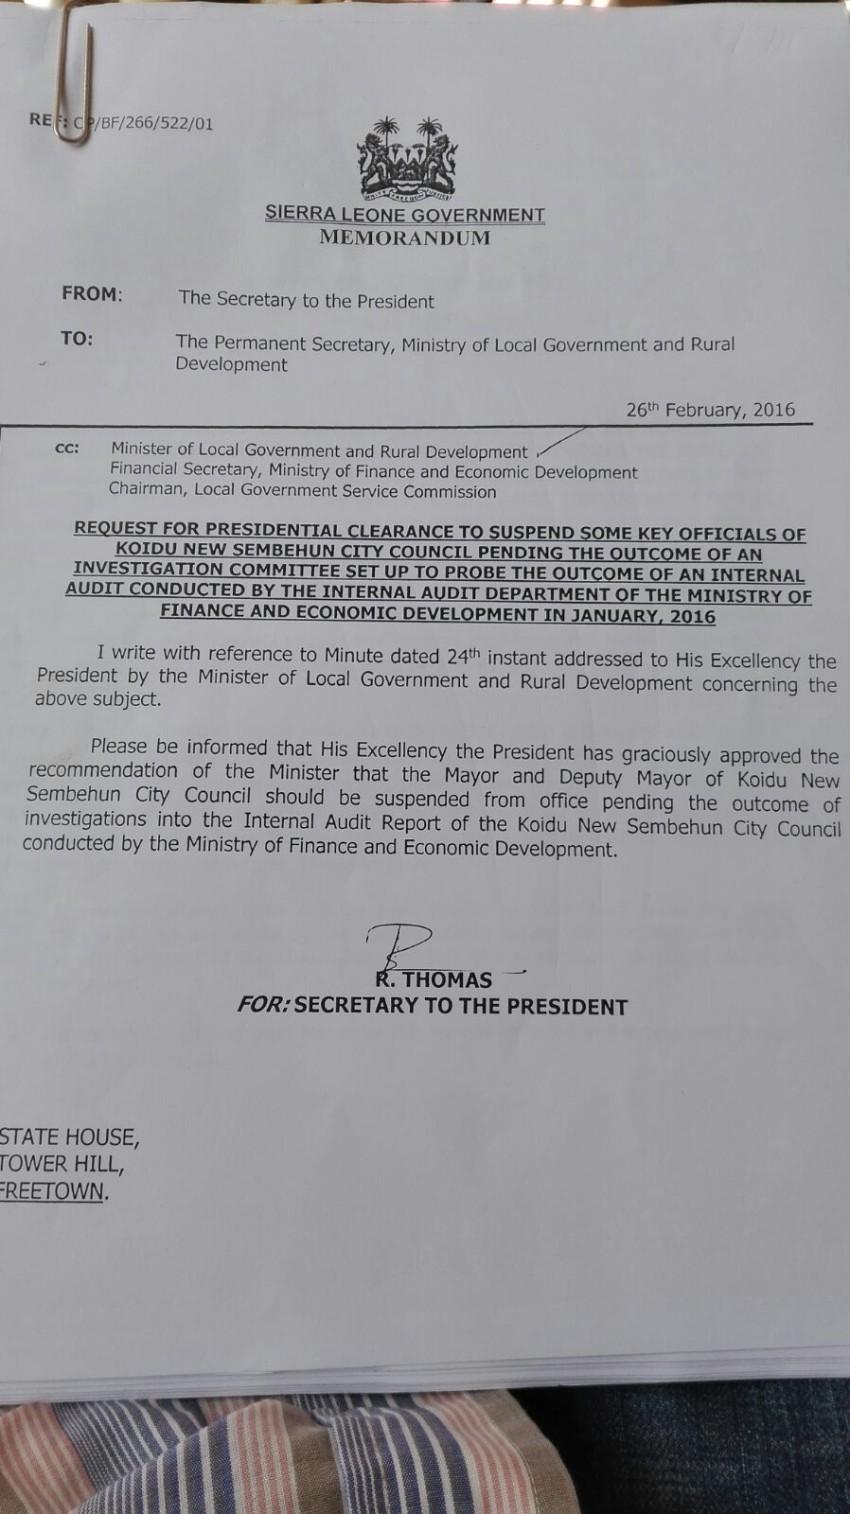 President Koroma suspends mayor Lamina of koidu